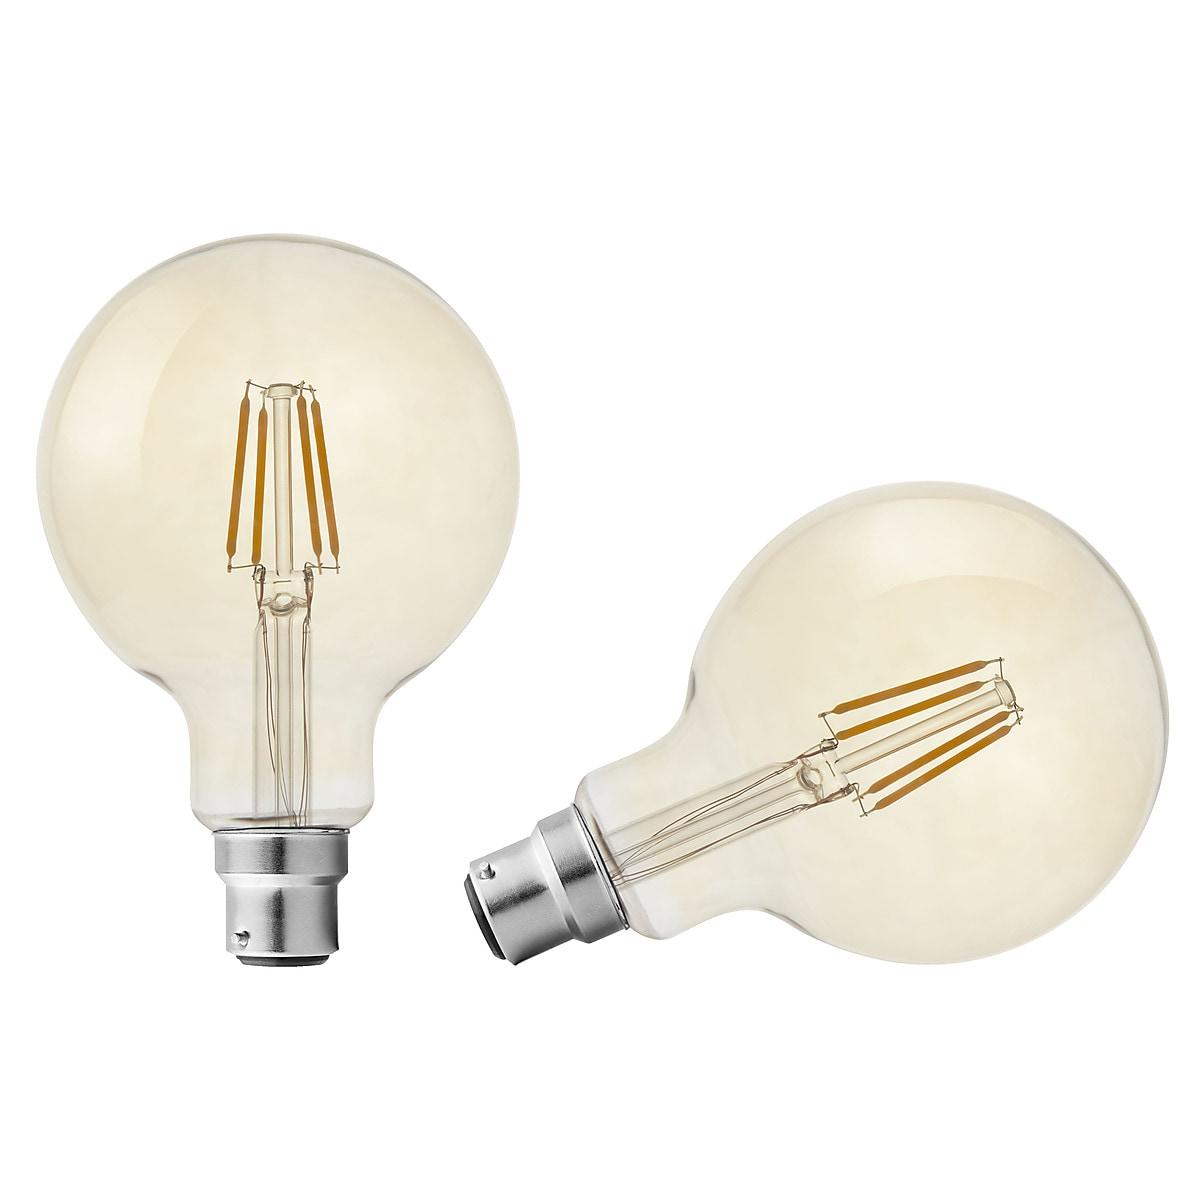 Northlight B22 Dimmable Globe LED Filament Bulb